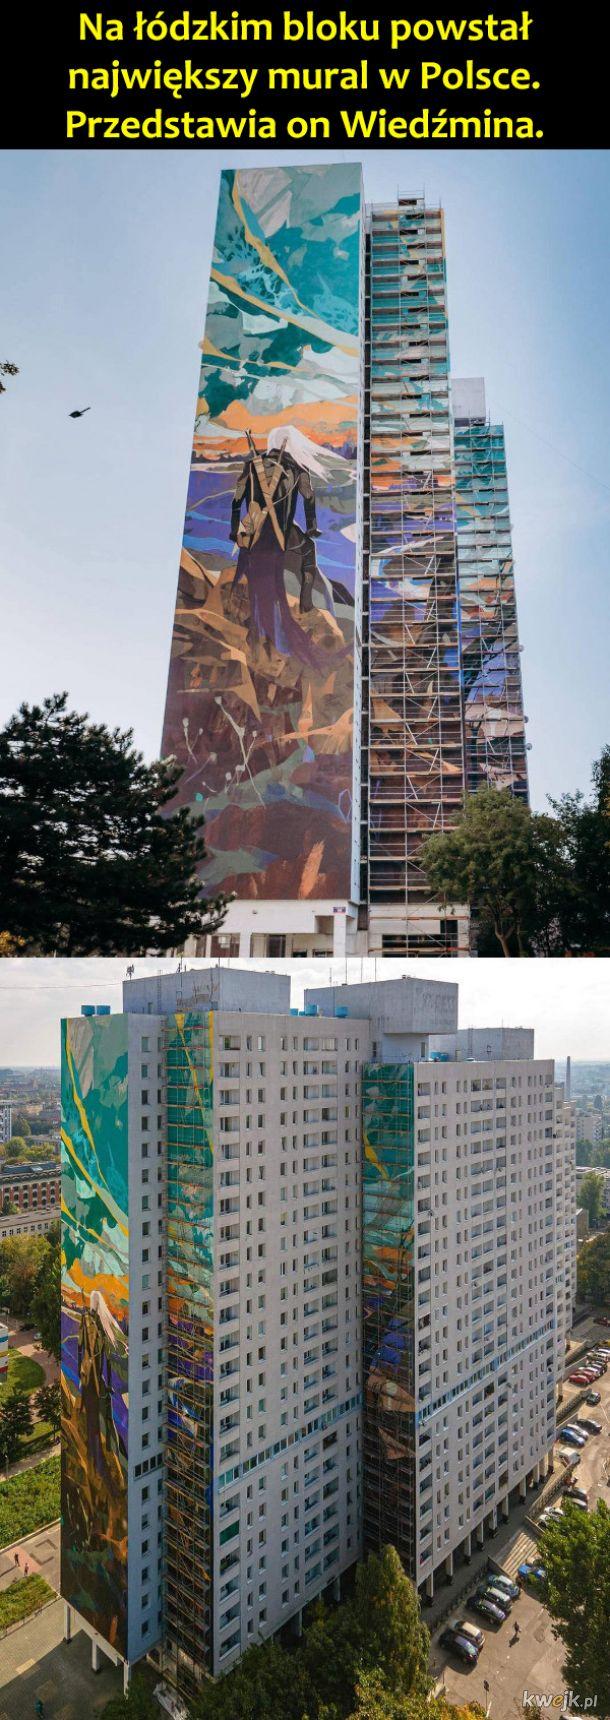 Łódzki mural